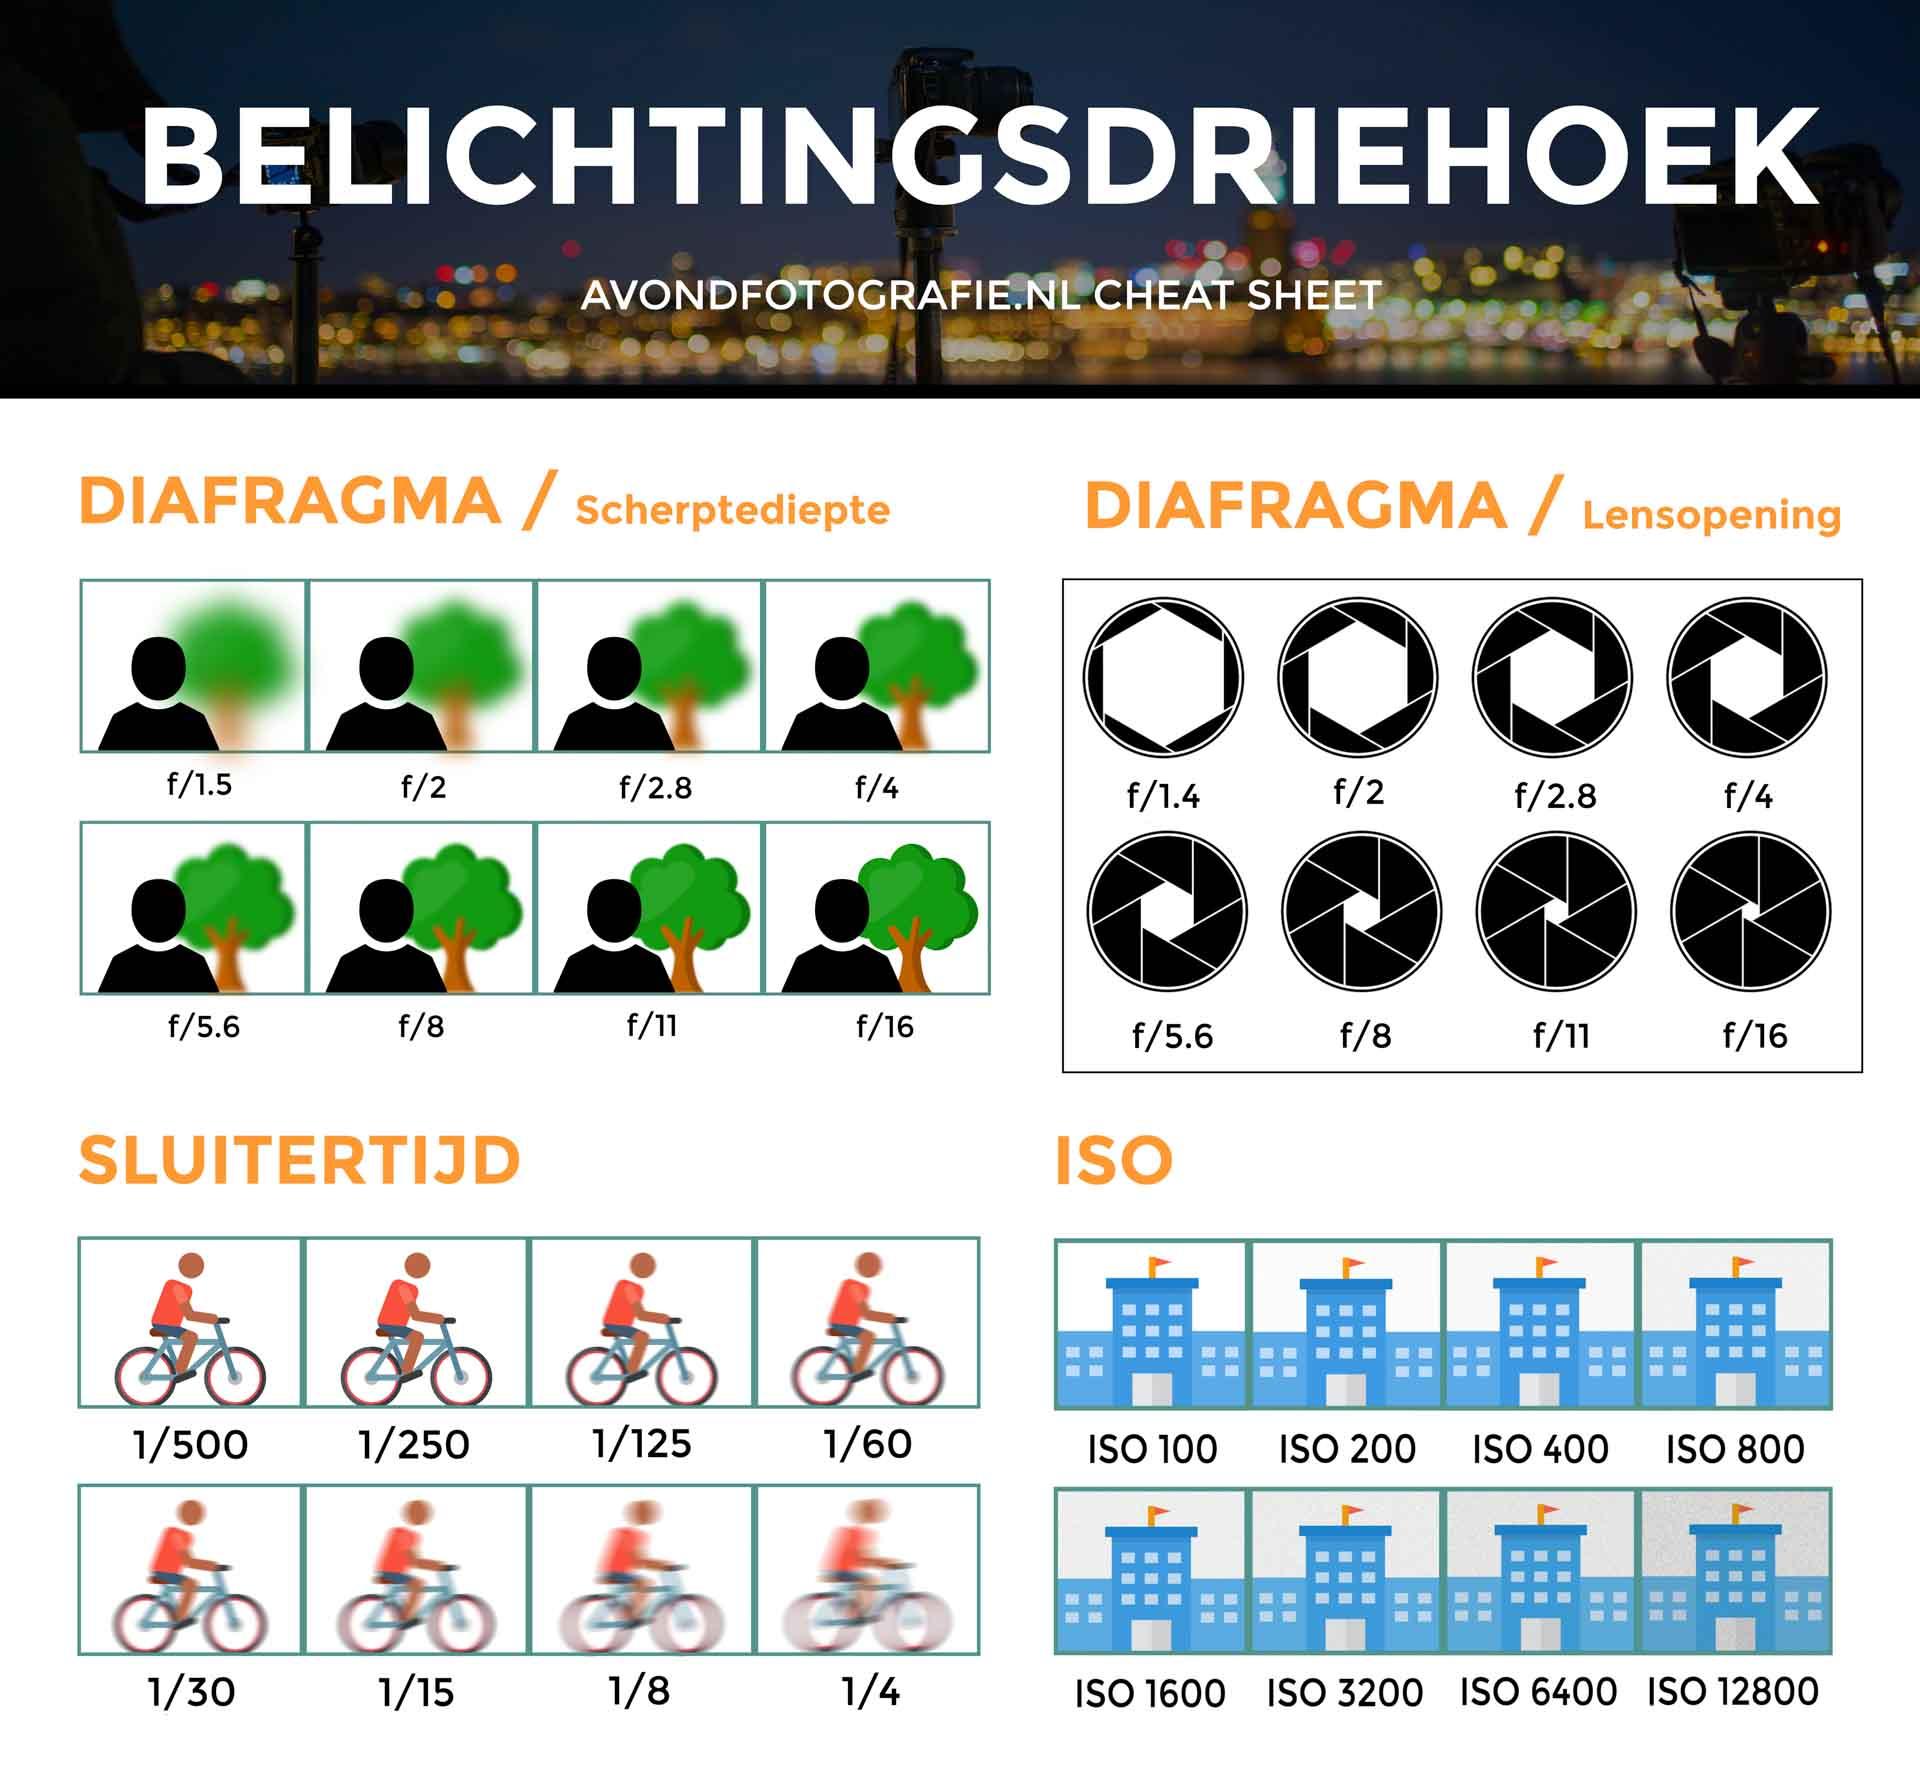 Belichtingsdriehoek cheat sheet Avondfotografie.nl